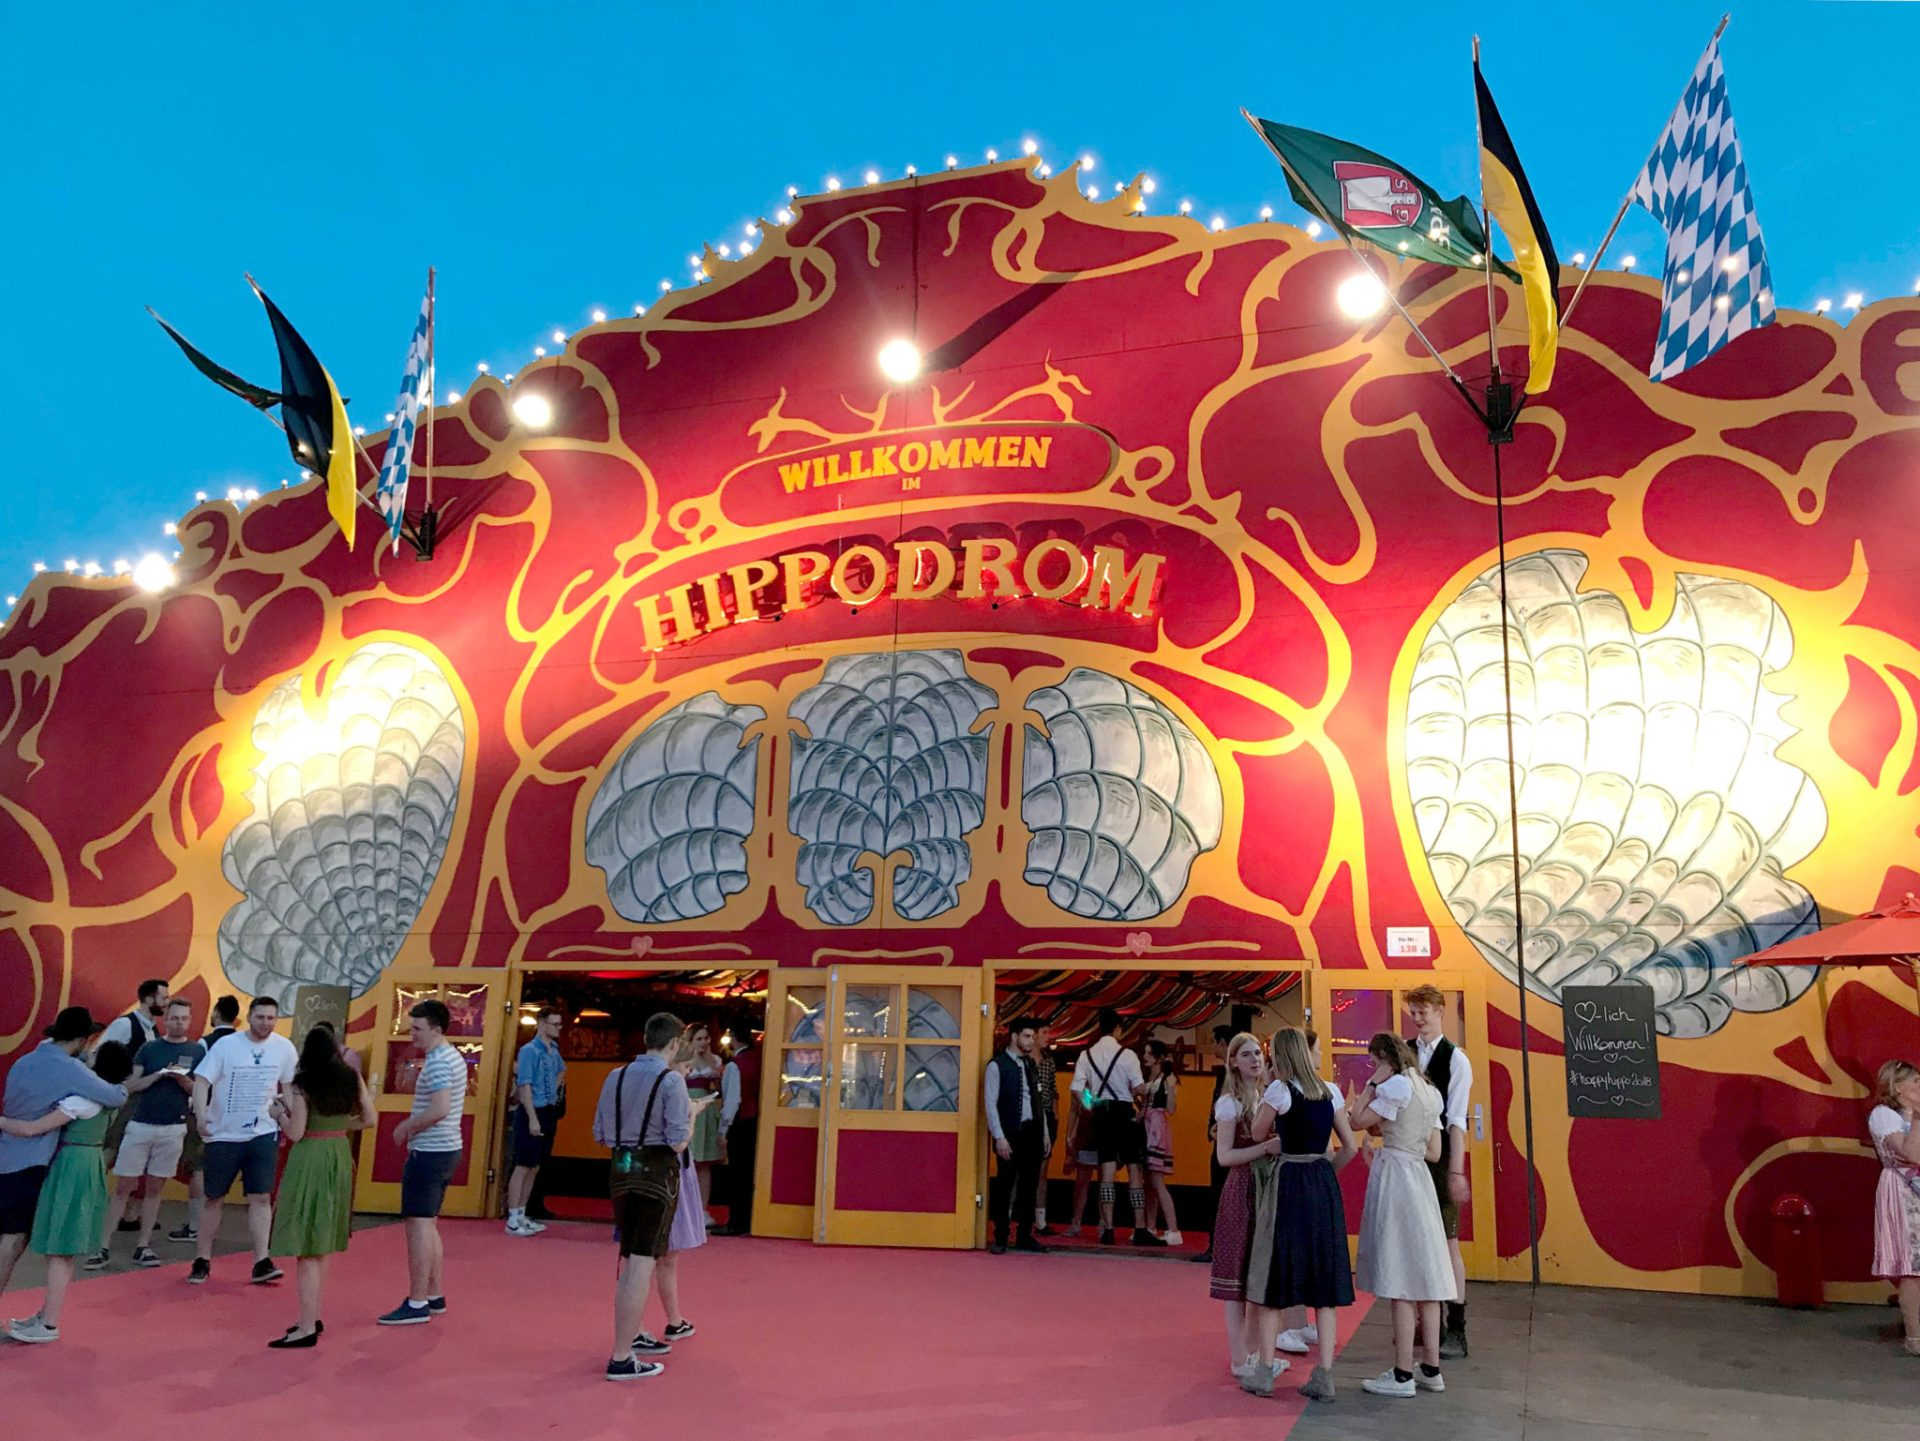 Happy Hippodrom – Das Frühlingsfest, meine neue Wies'n